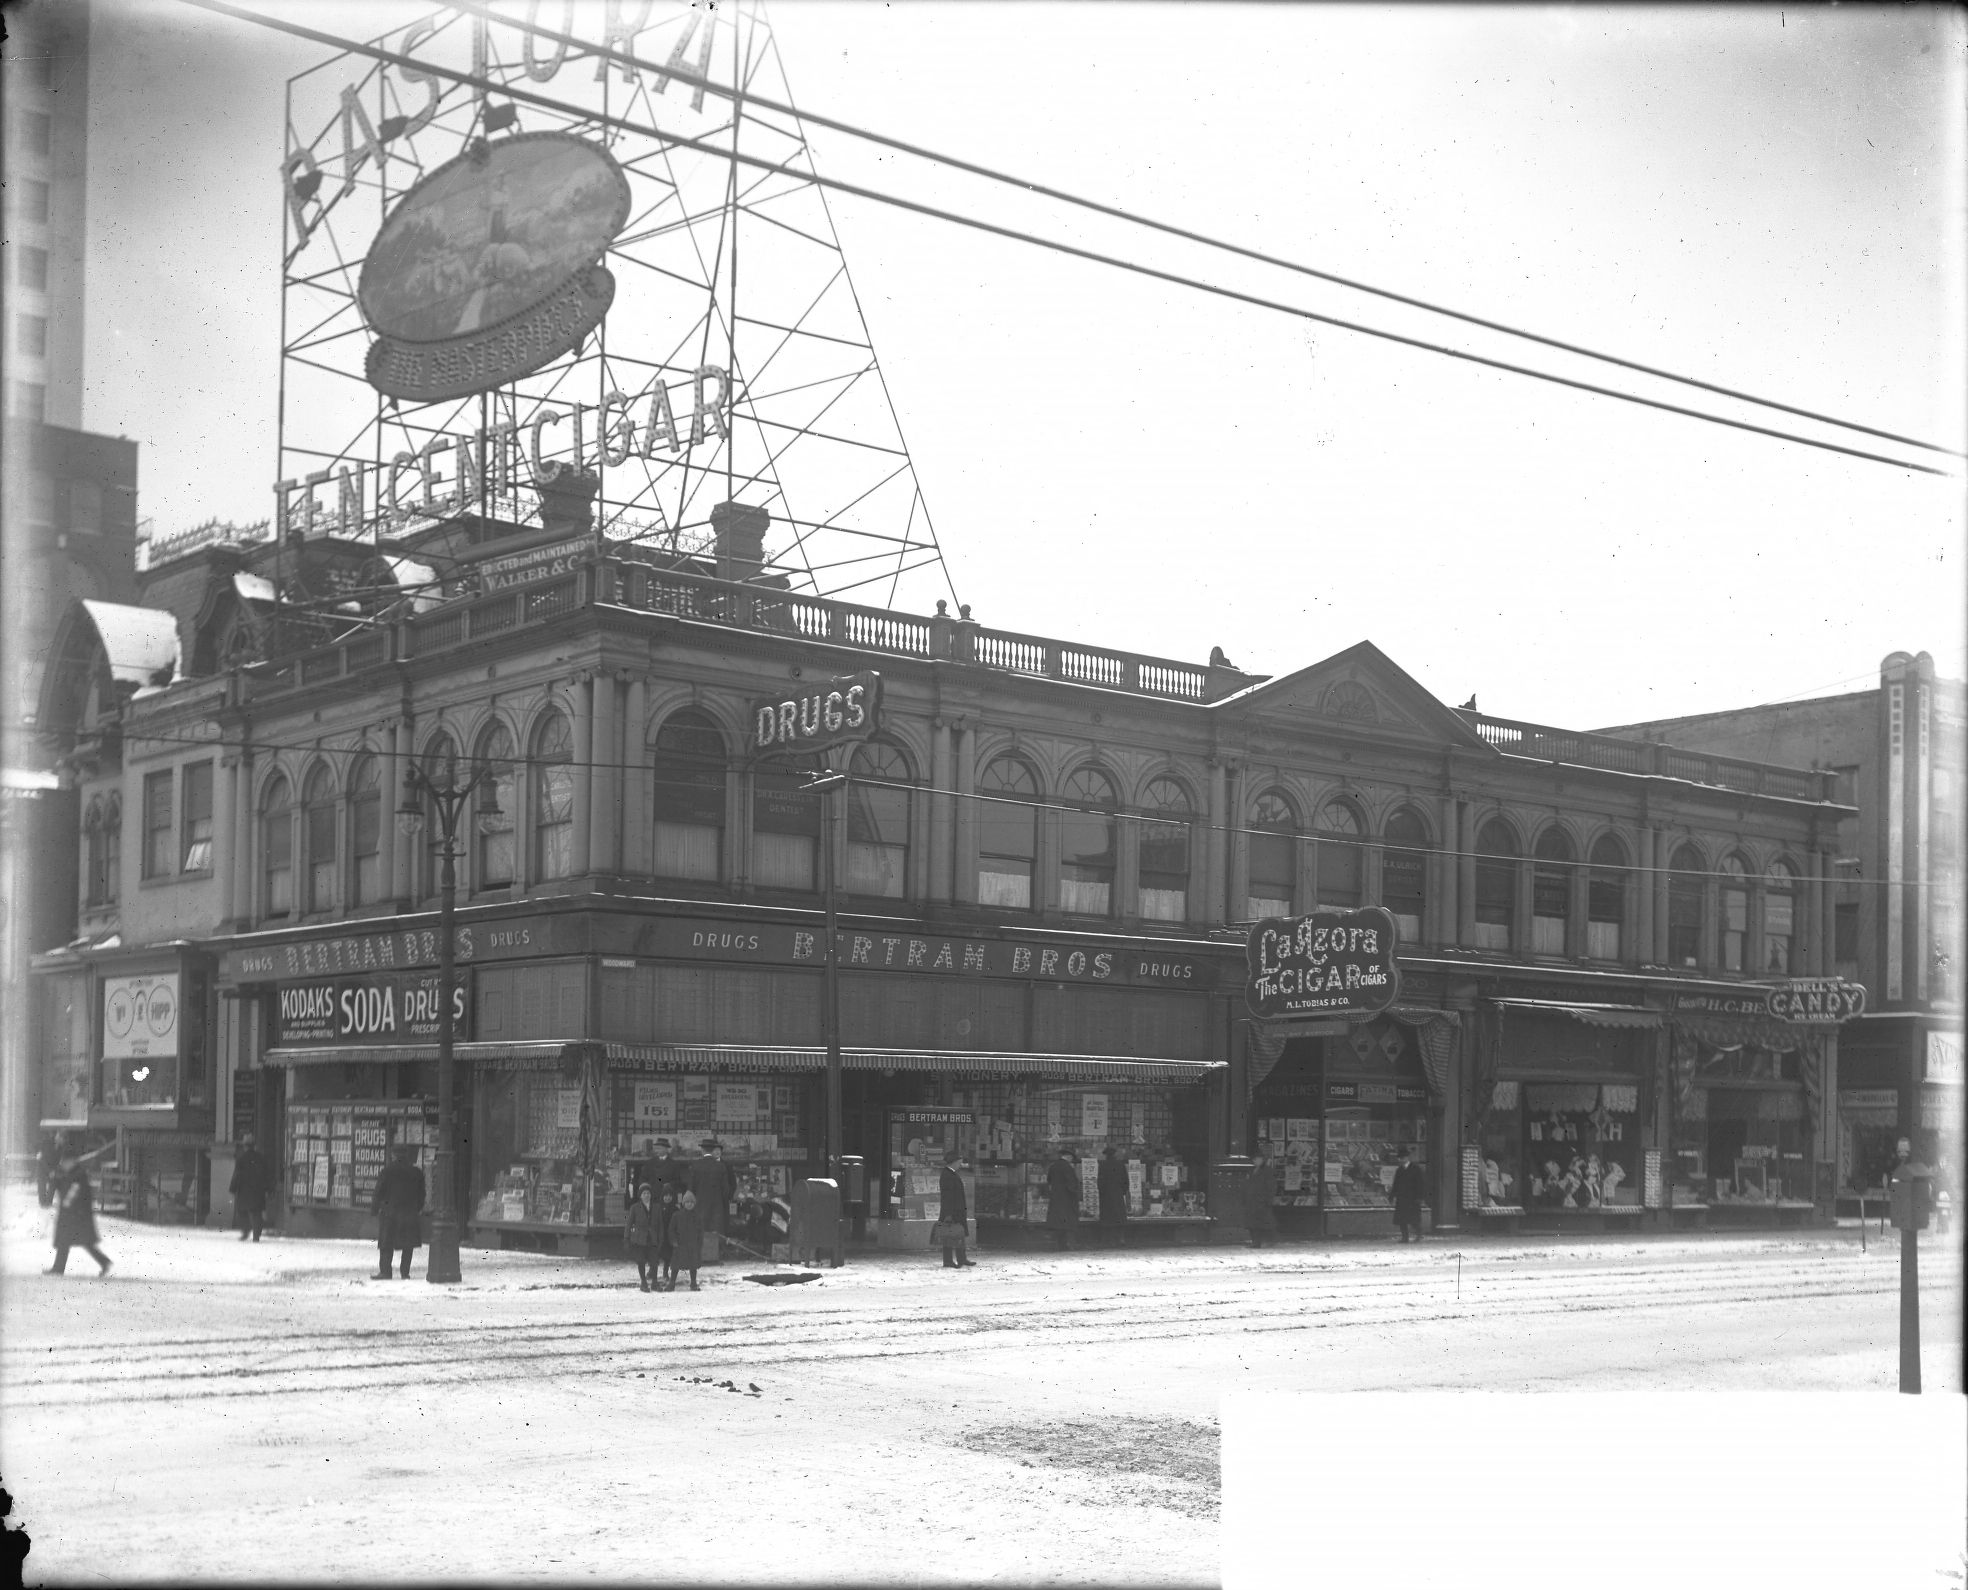 Winter scene of Bertram Bros. Drug Store, located at 2029 Woodward Avenue in Detroit circa 1930